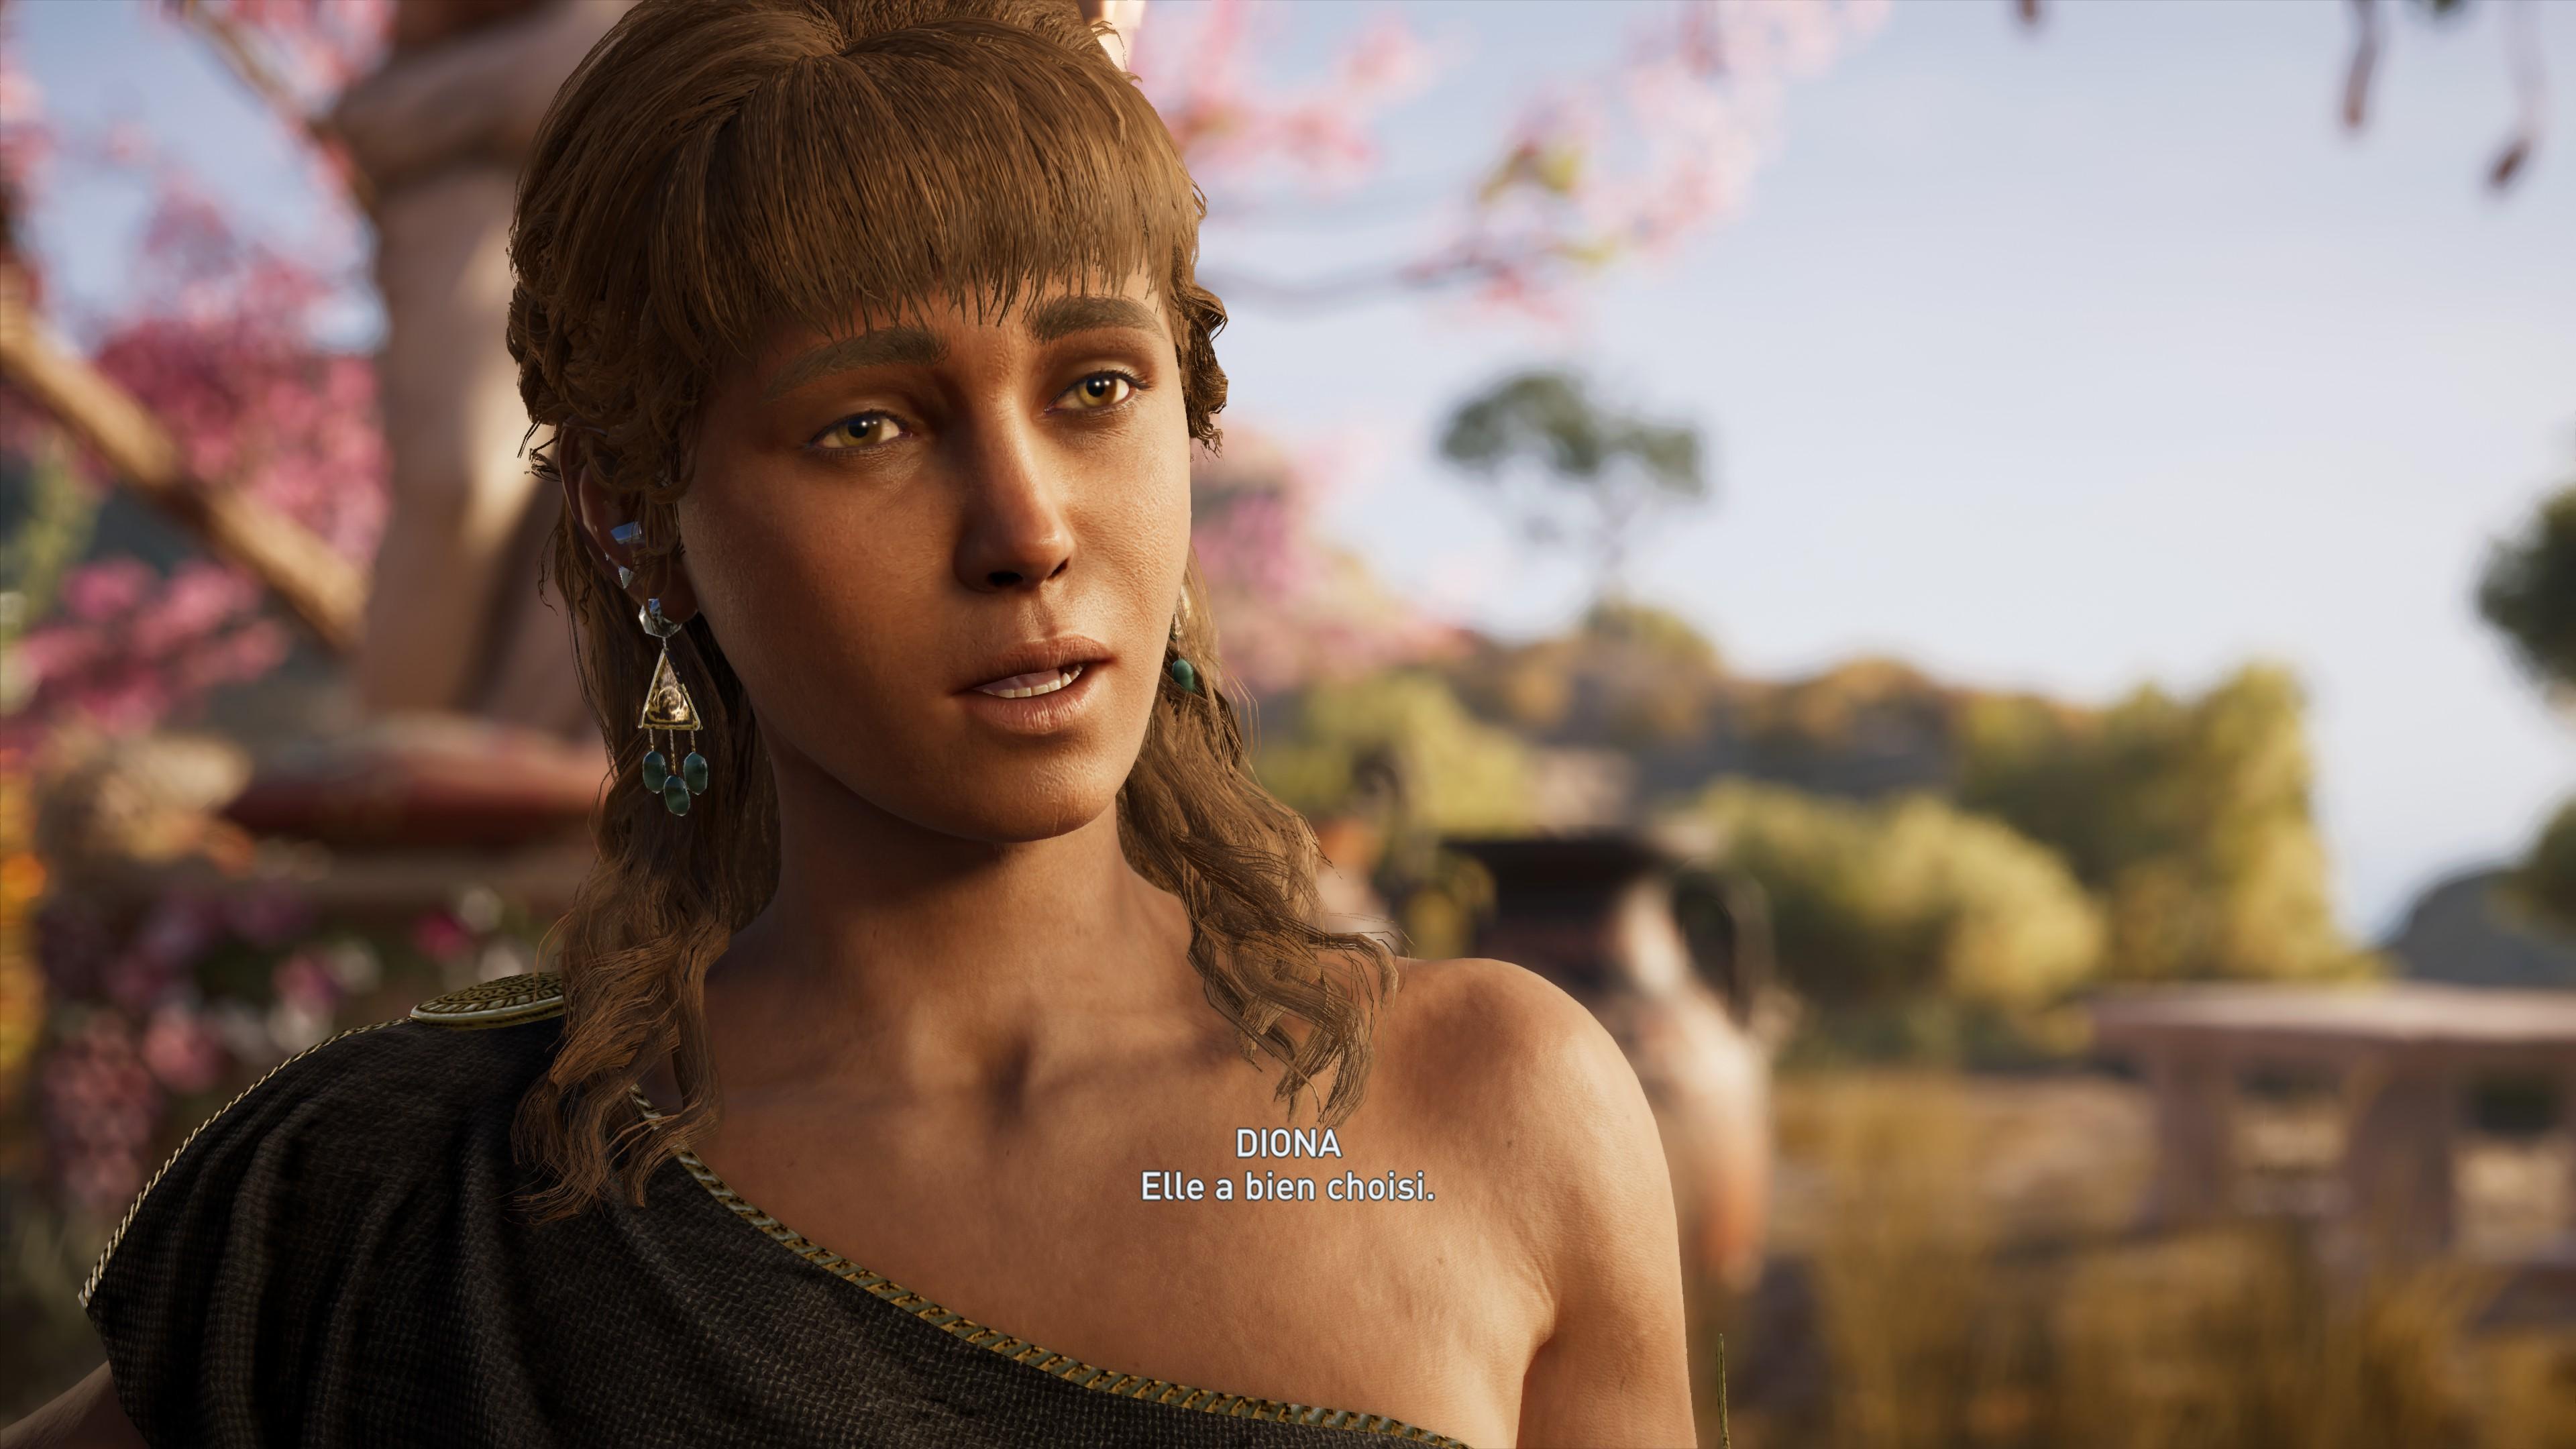 AC Odyssey: Diona - Romance - Assassins Creed Odyssey